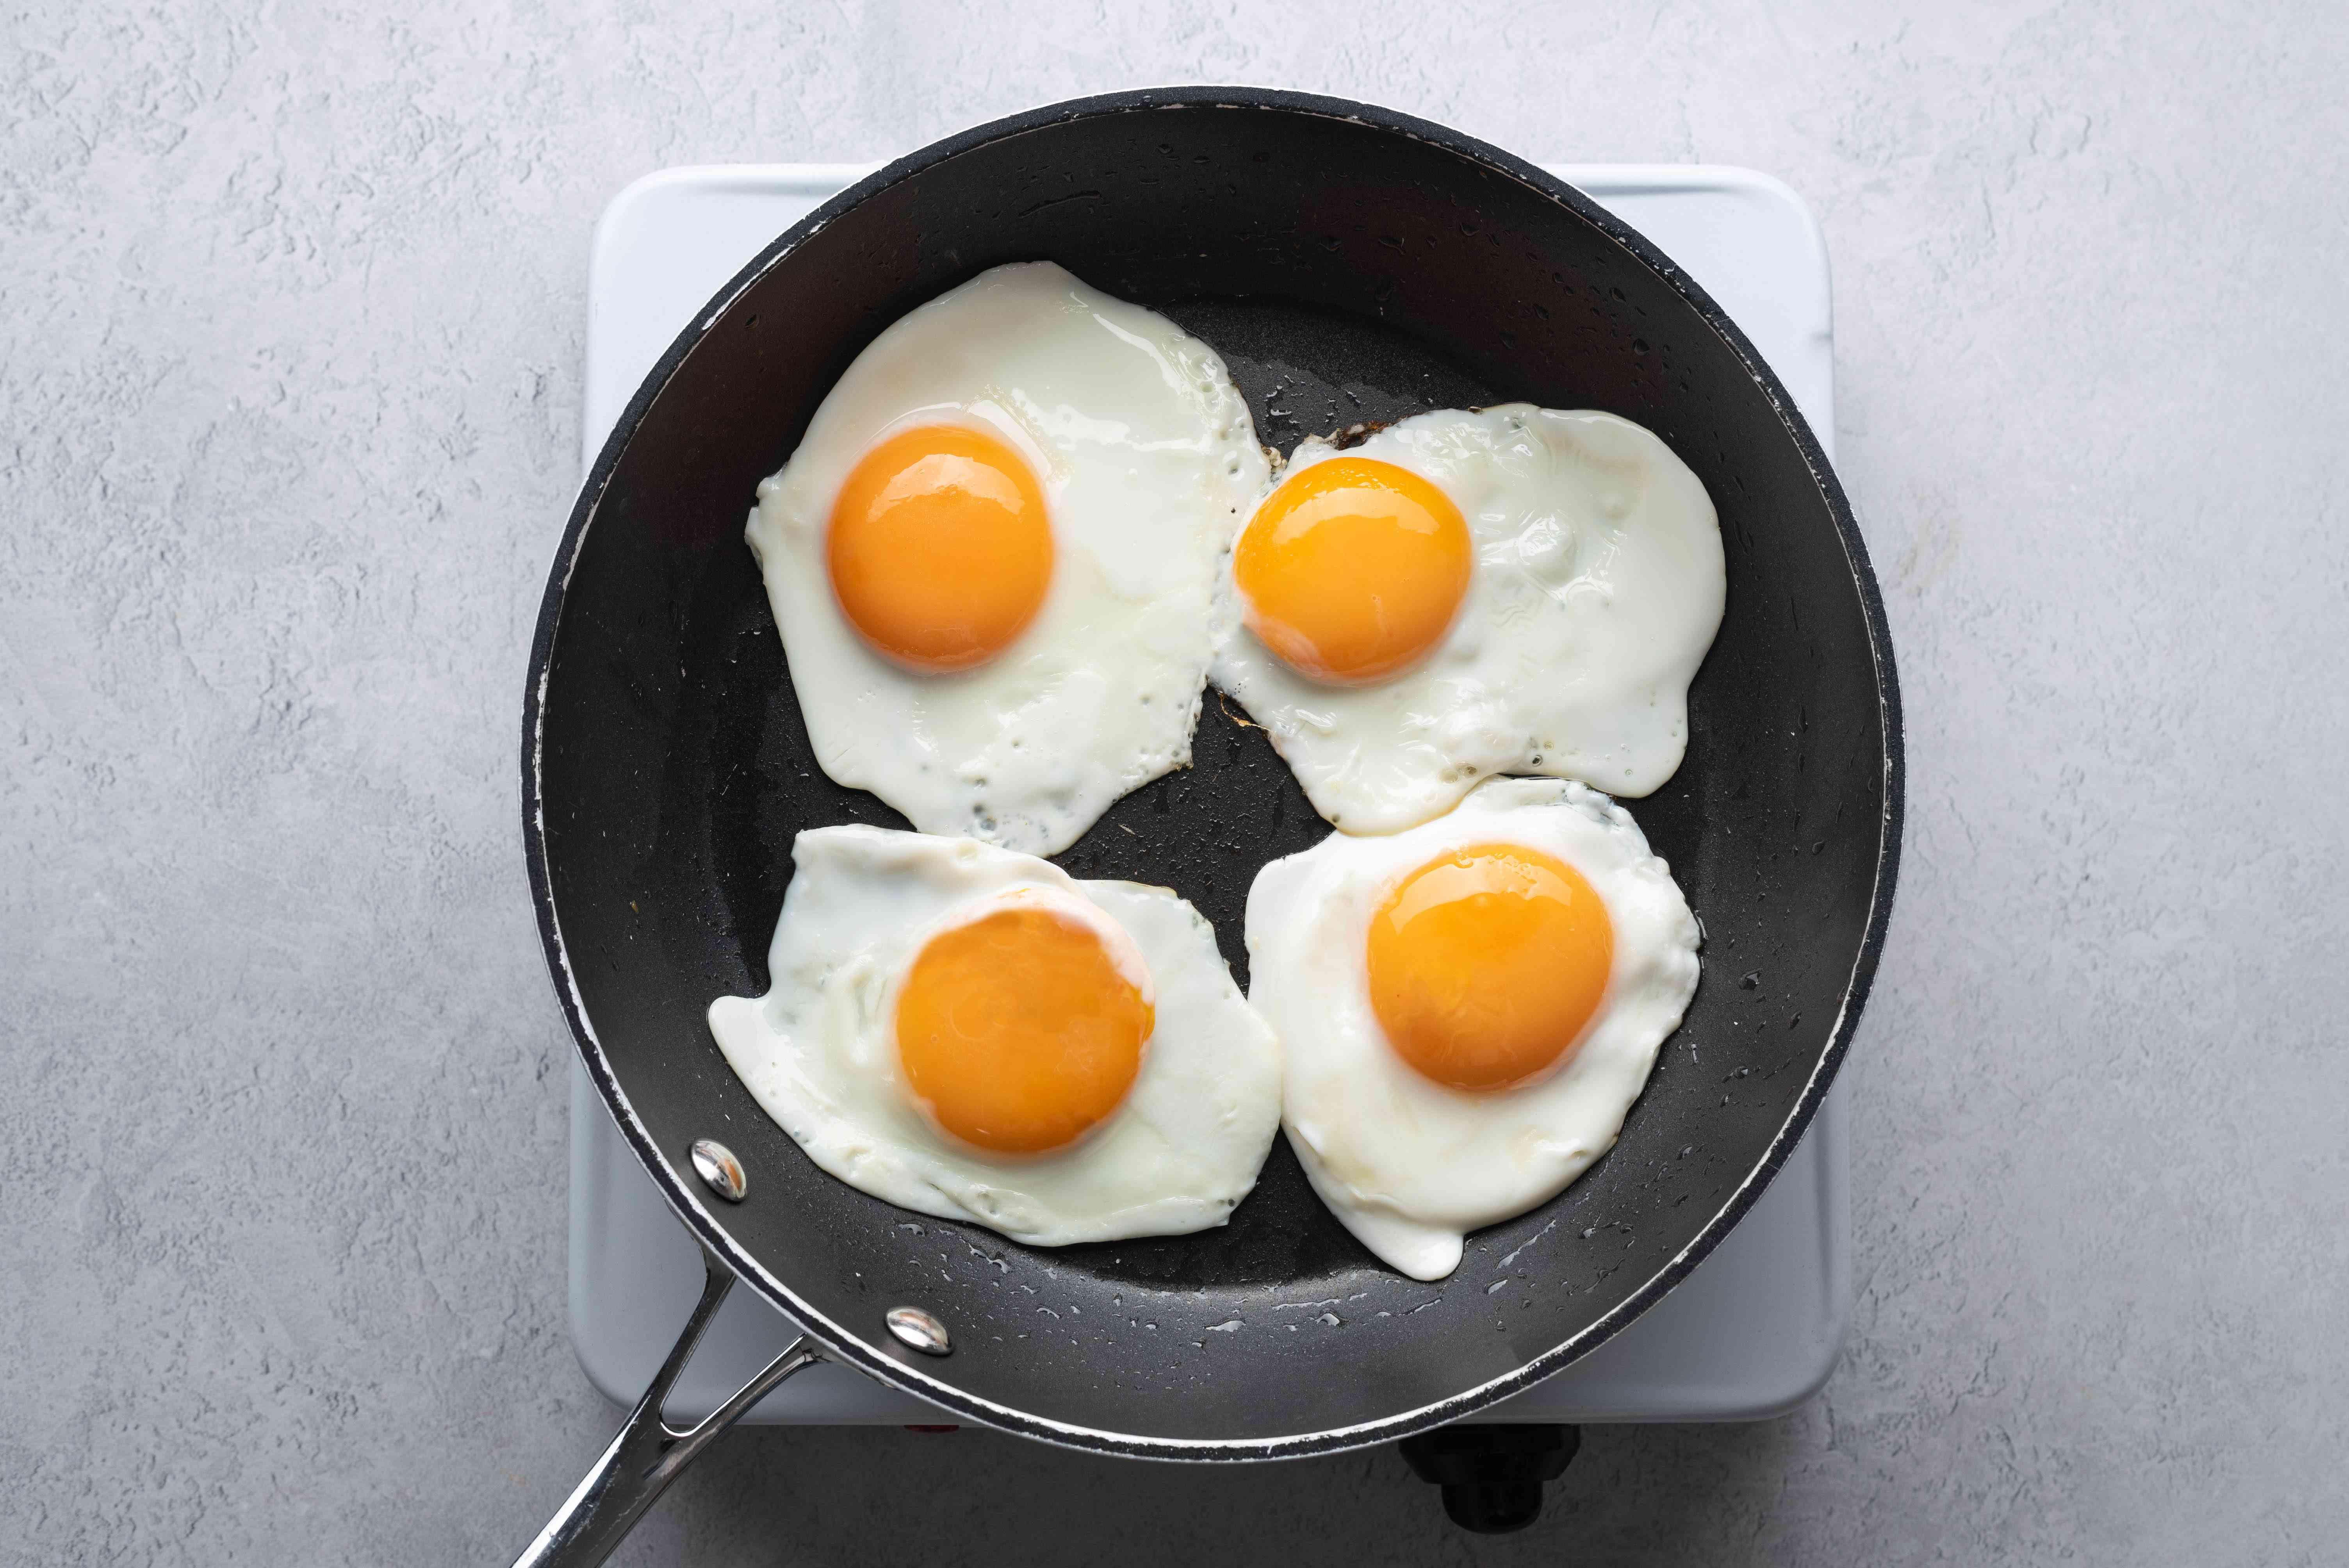 eggs frying in the pan